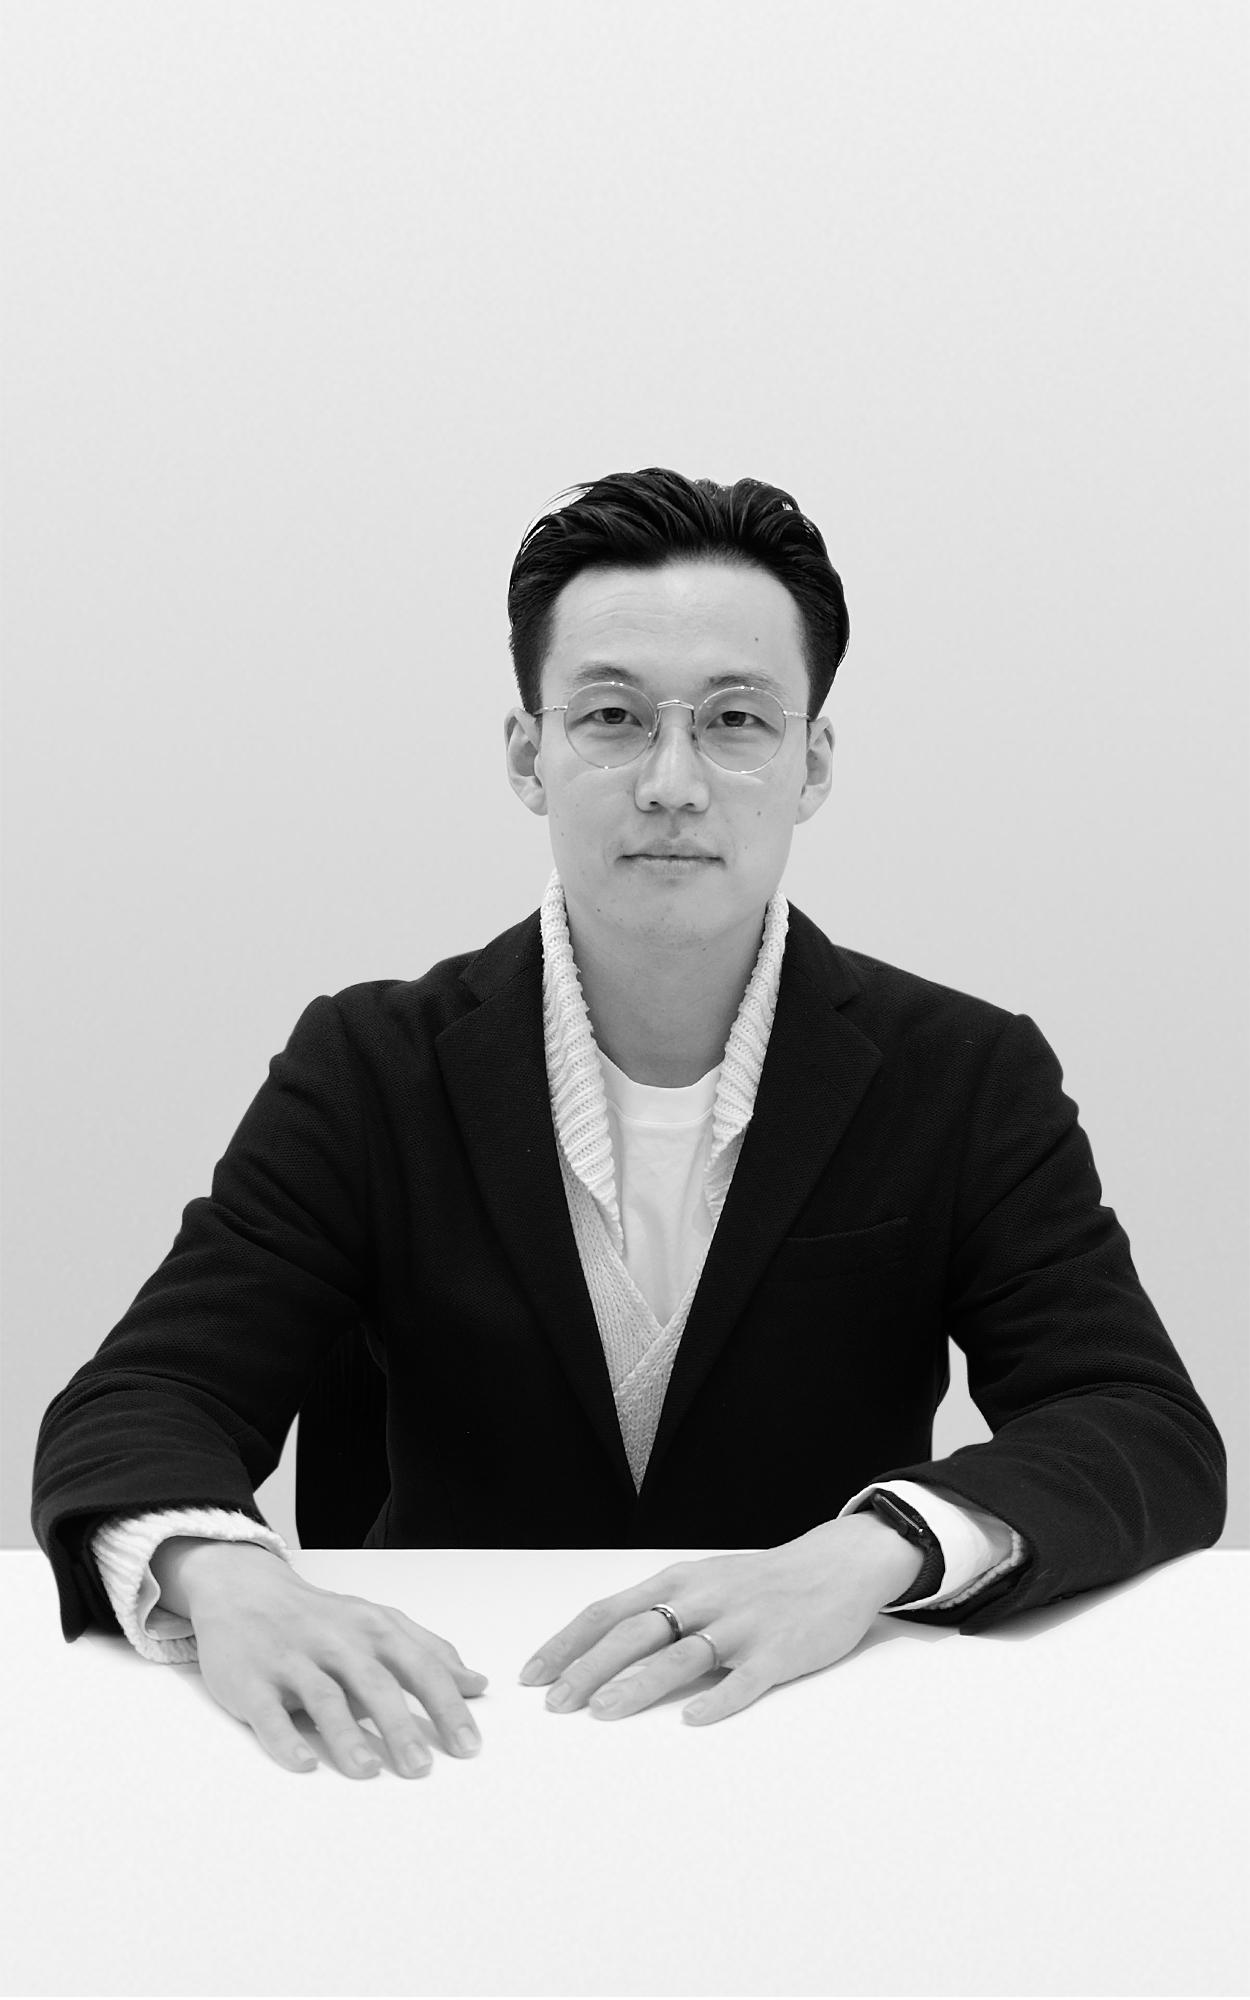 Patrick Wu 吴星恒